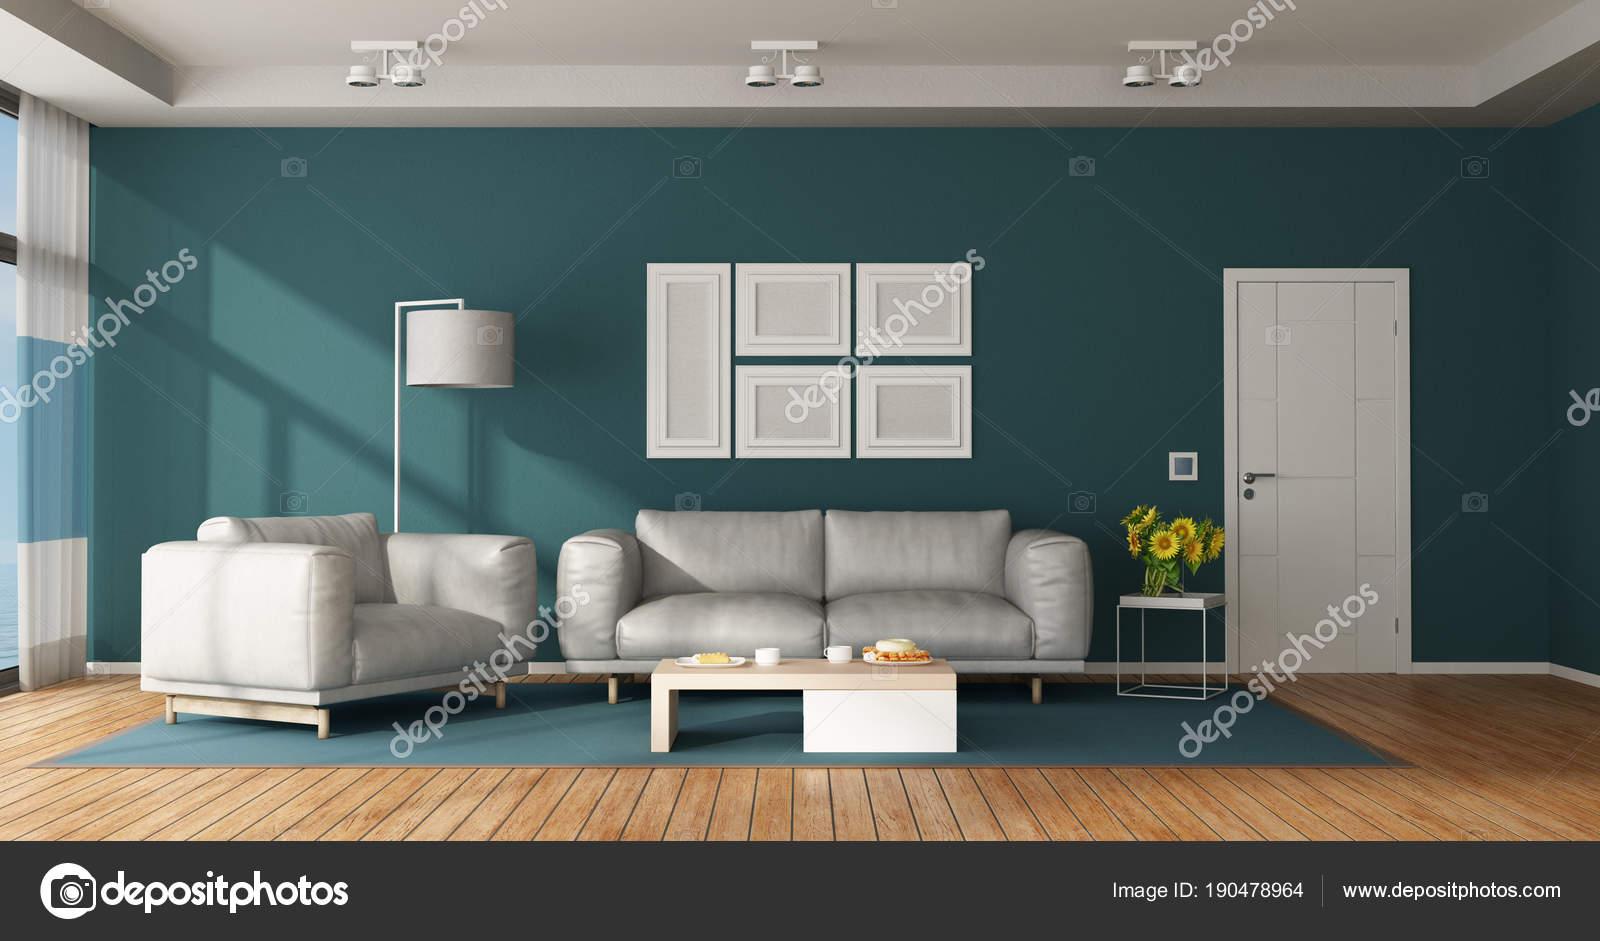 https://st3.depositphotos.com/1047404/19047/i/1600/depositphotos_190478964-stockafbeelding-moderne-woonkamer-blauw-en-wit.jpg